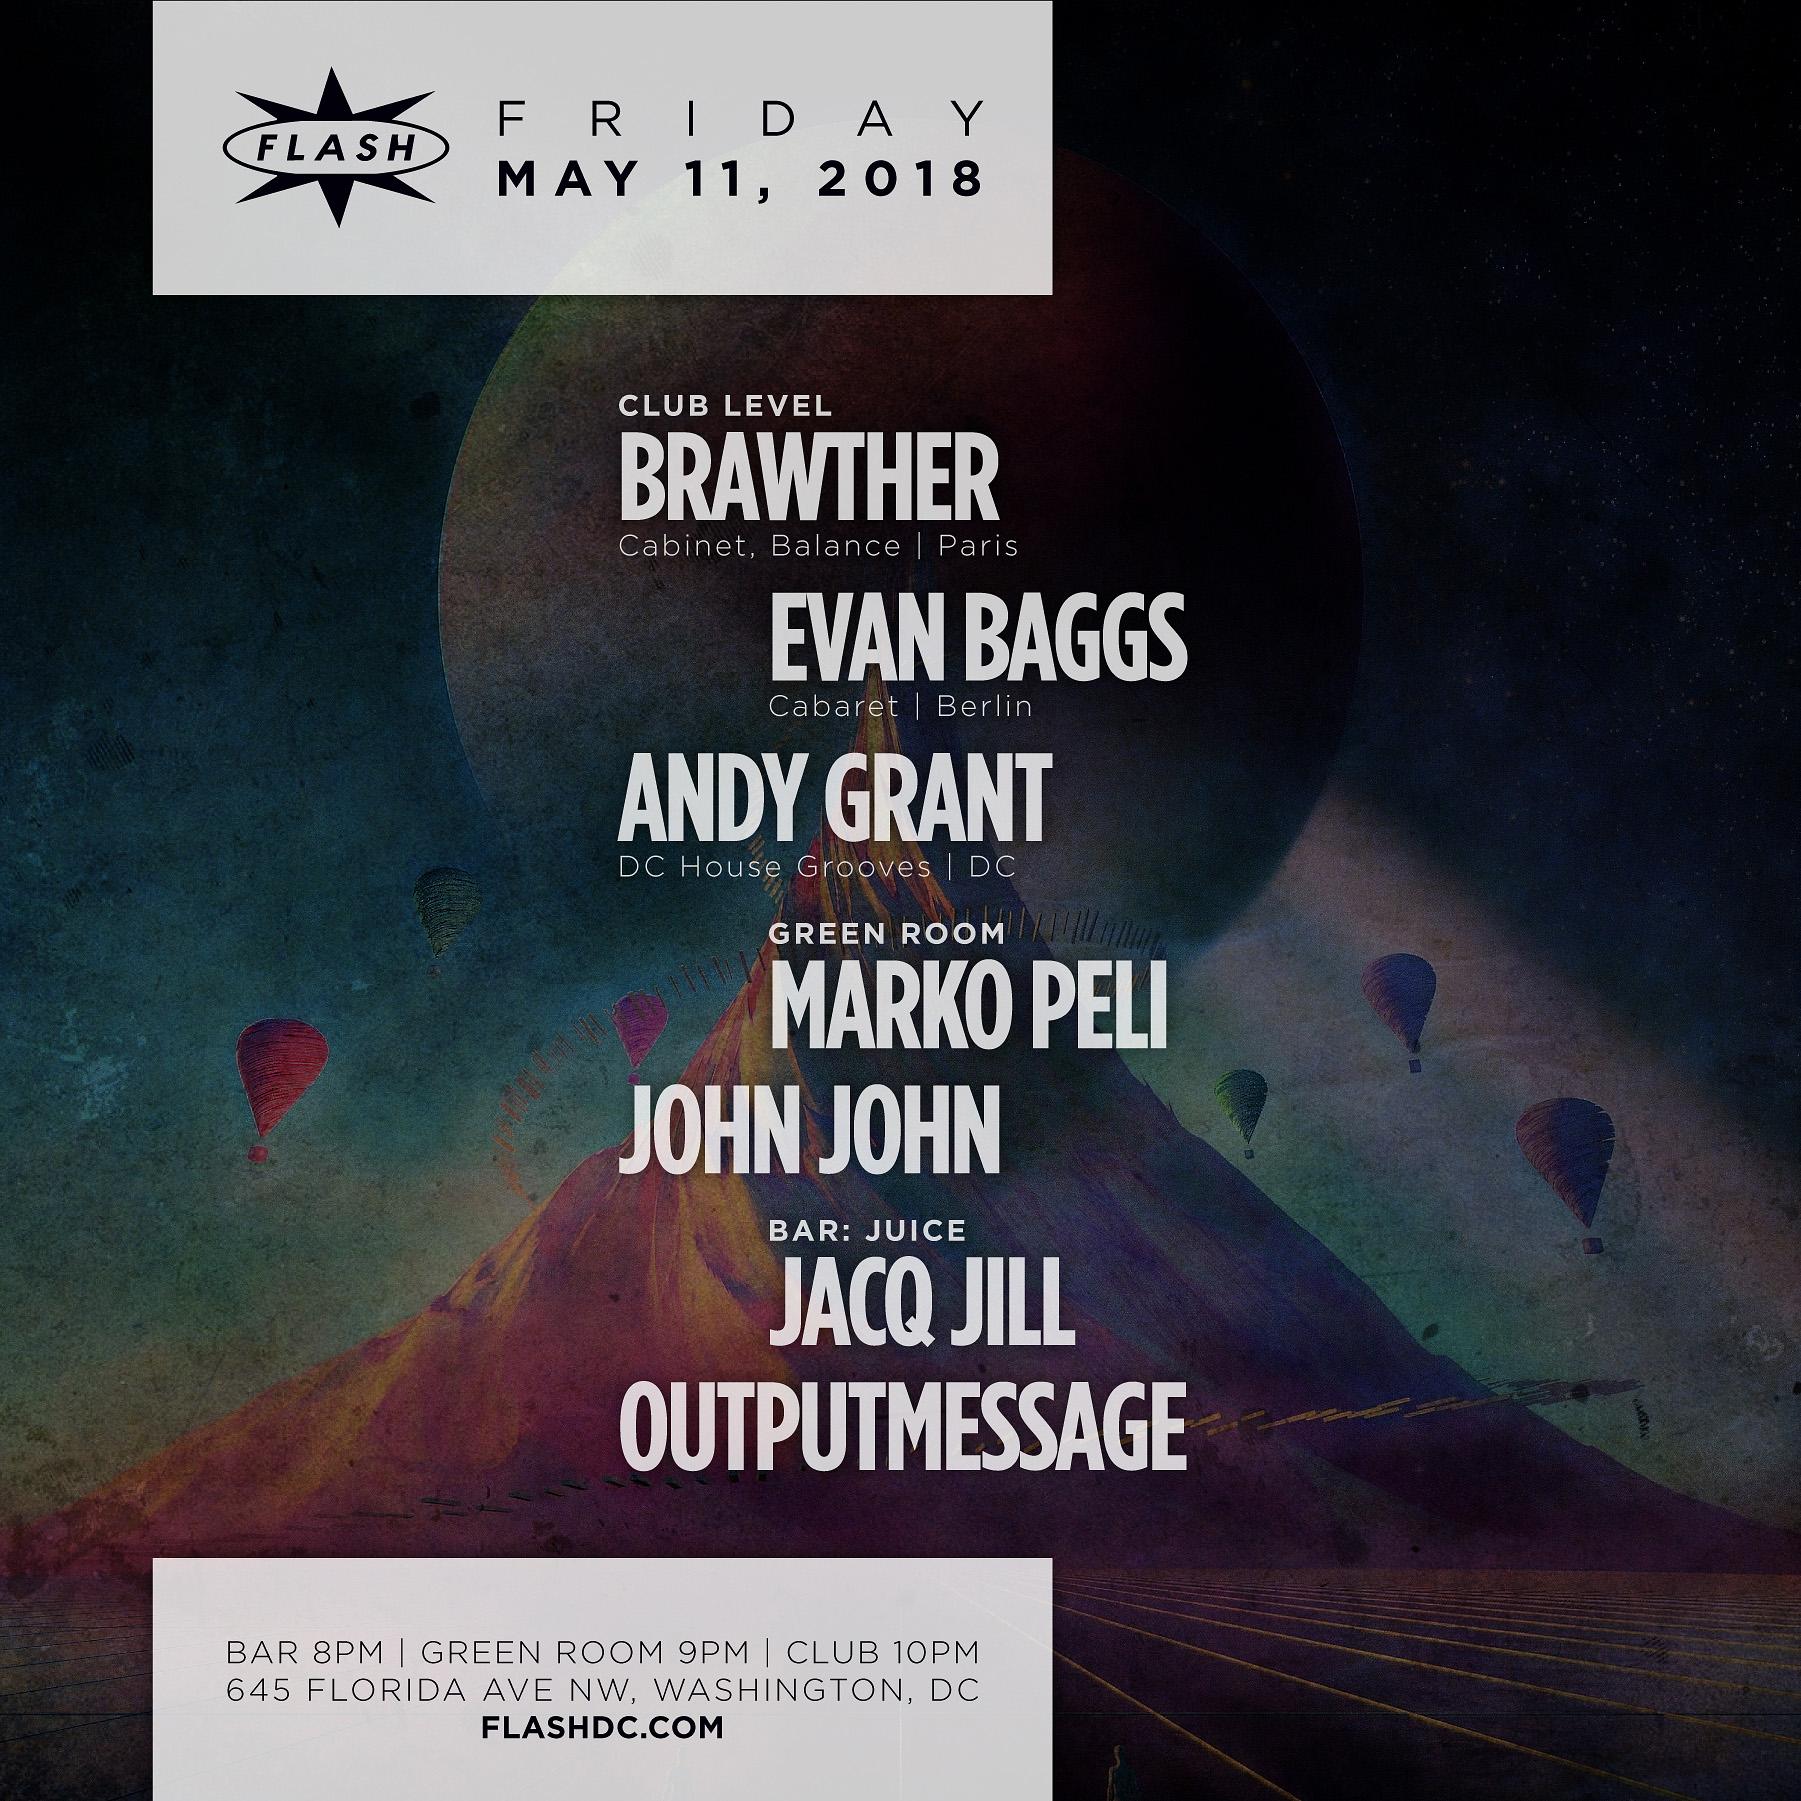 Brawther - Evan Baggs event thumbnail